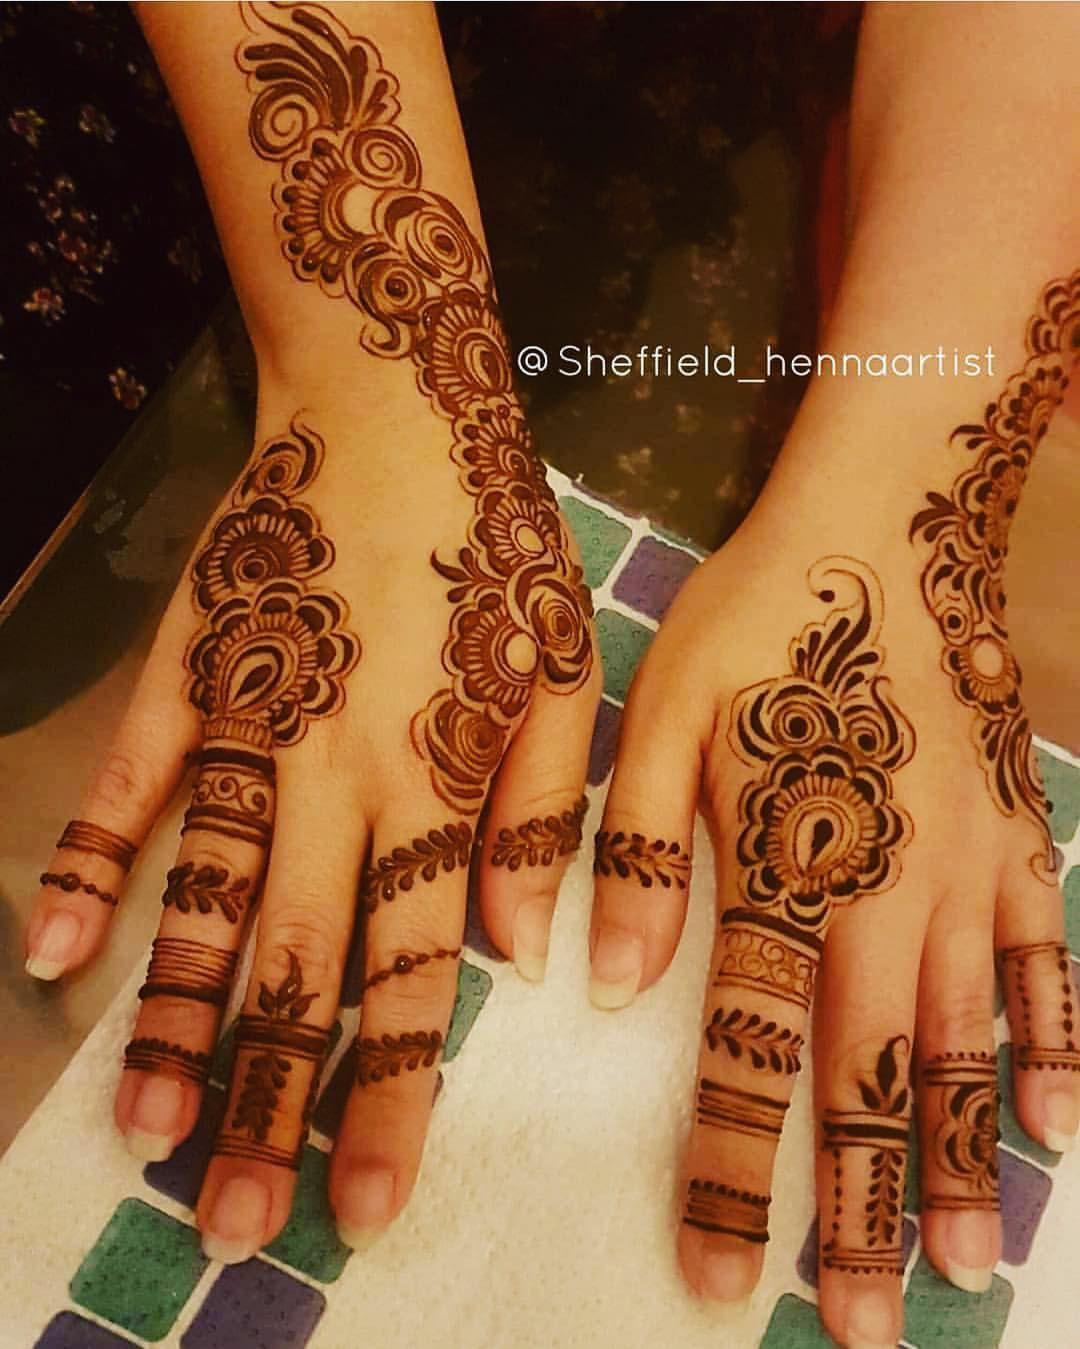 ام تركي نقاشه في المدينه المنوره Hana4931 Hana4931 نقاشه نقاشه المدينه المنوره نقاشه المدينه نقاشه عرايس نقش Hand Henna Hand Tattoos Henna Hand Tattoo